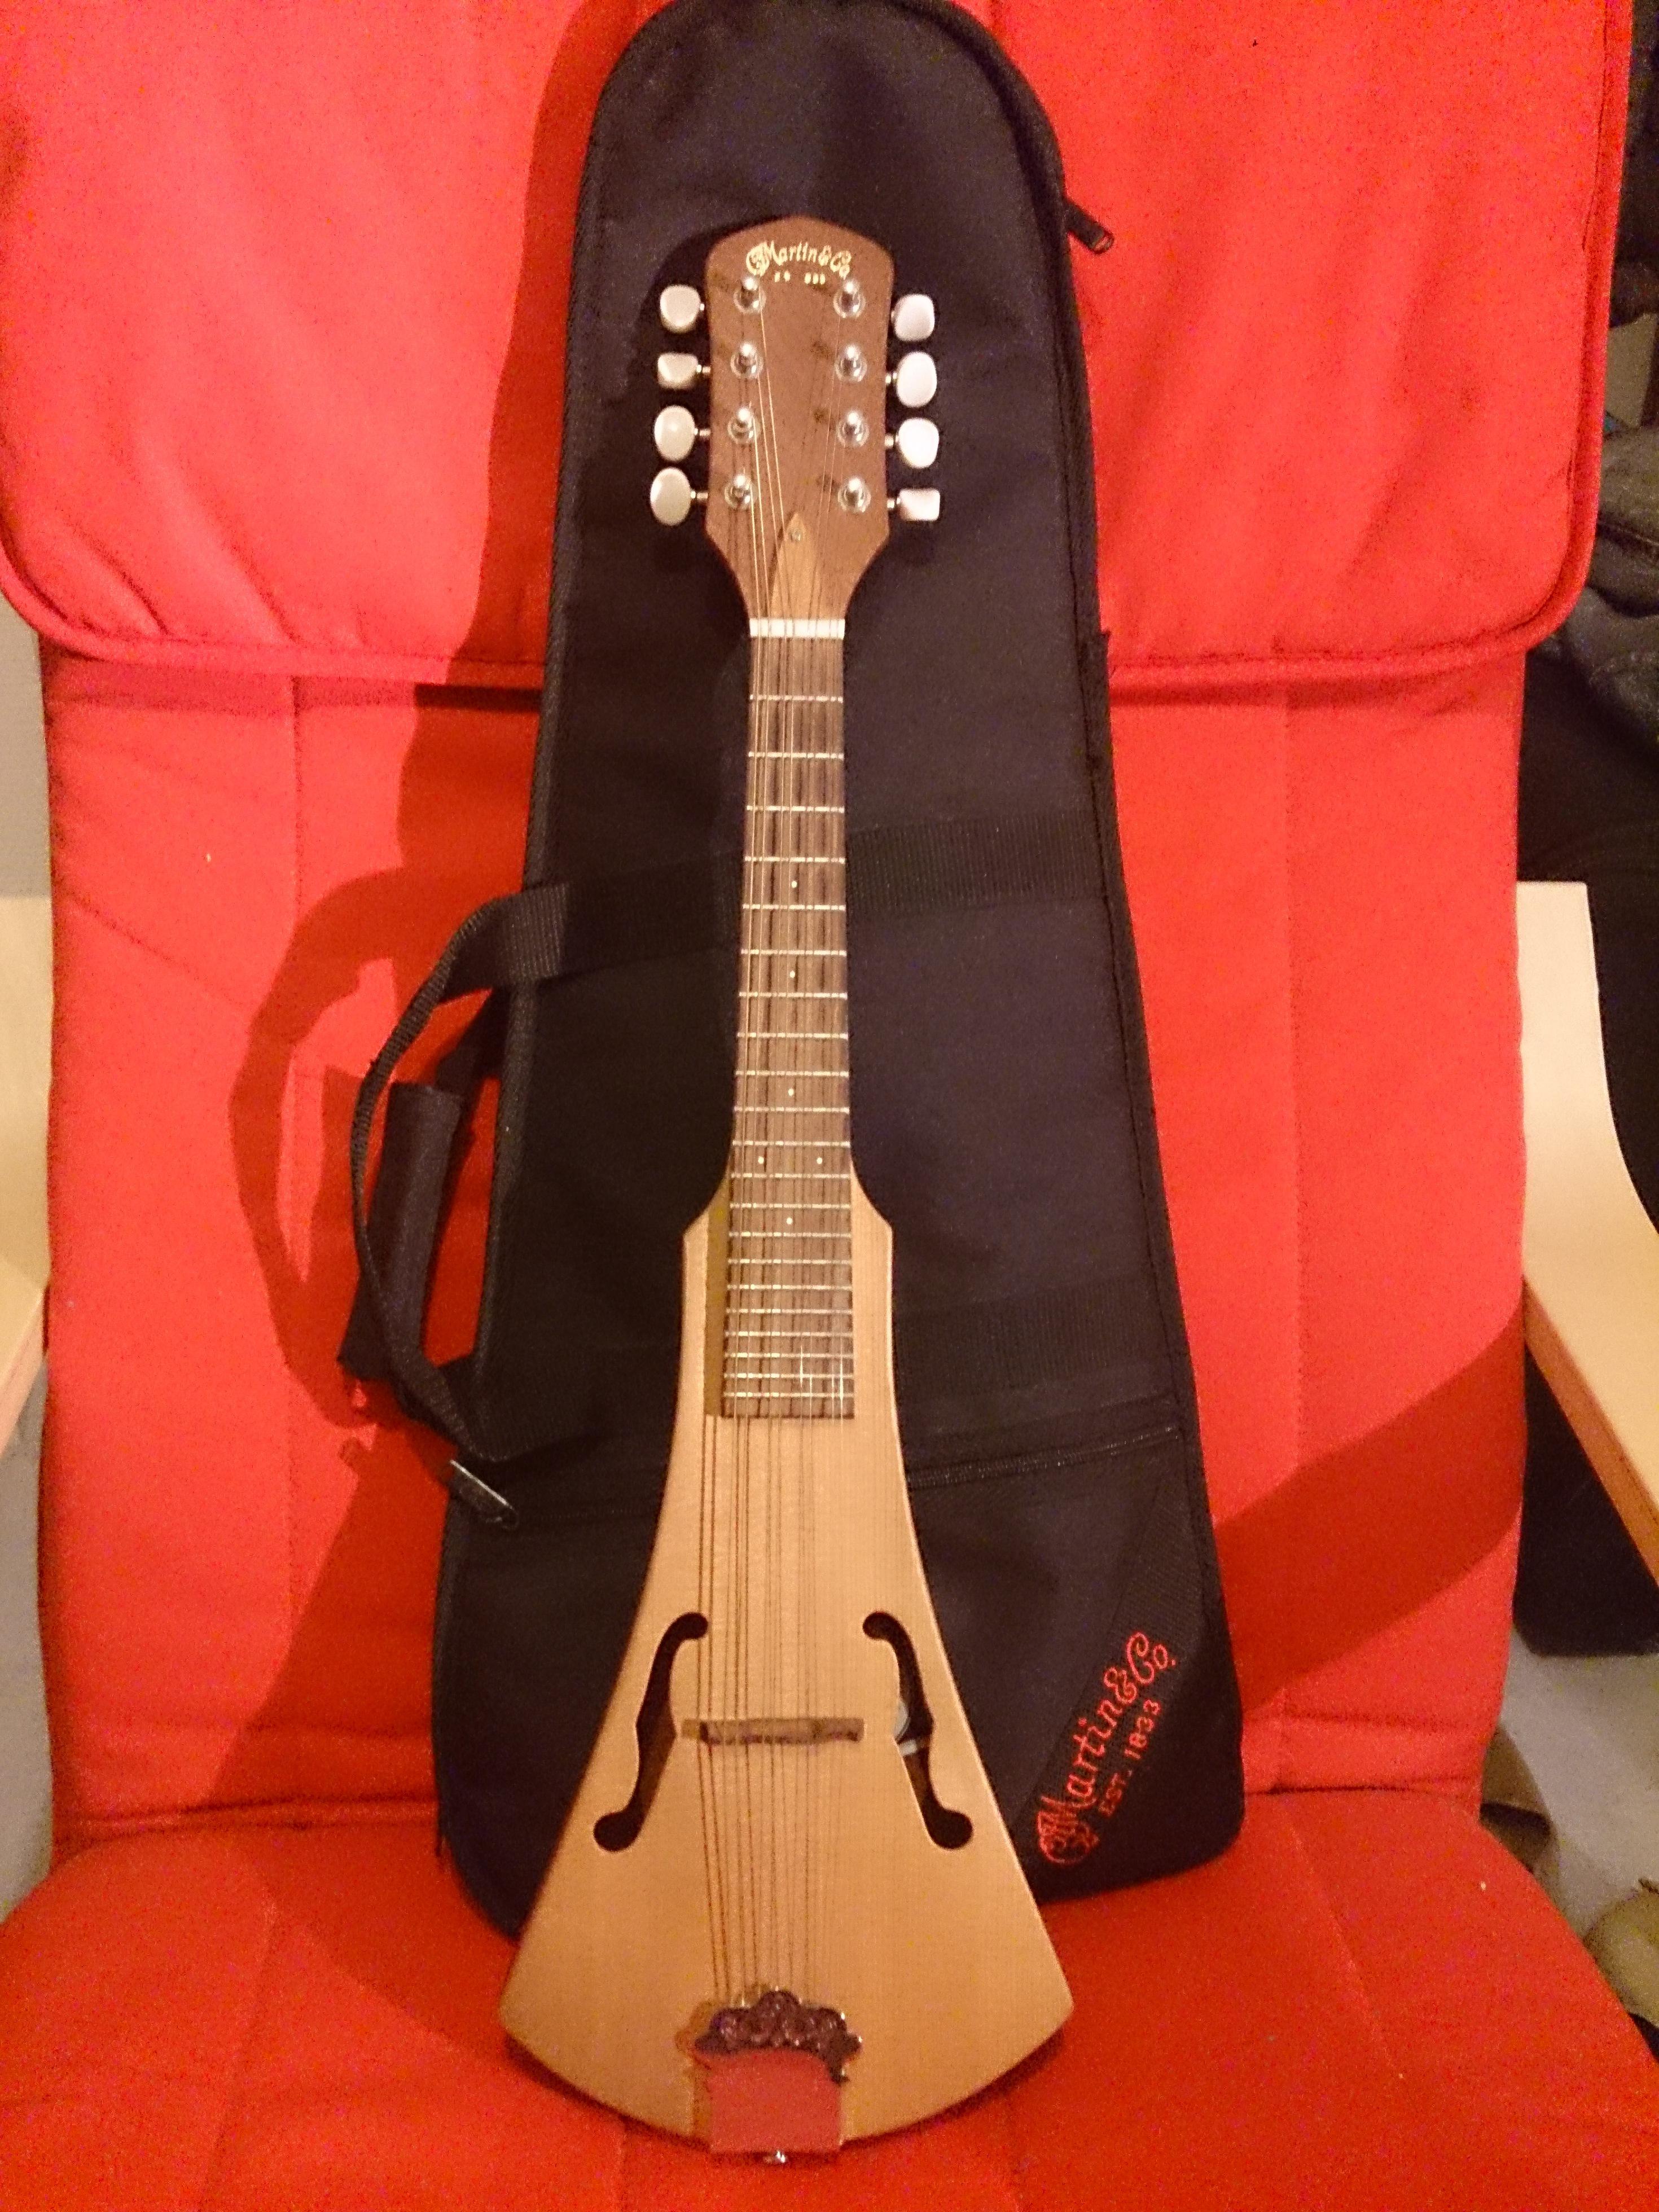 backpacker mandolin martin co backpacker mandolin audiofanzine. Black Bedroom Furniture Sets. Home Design Ideas